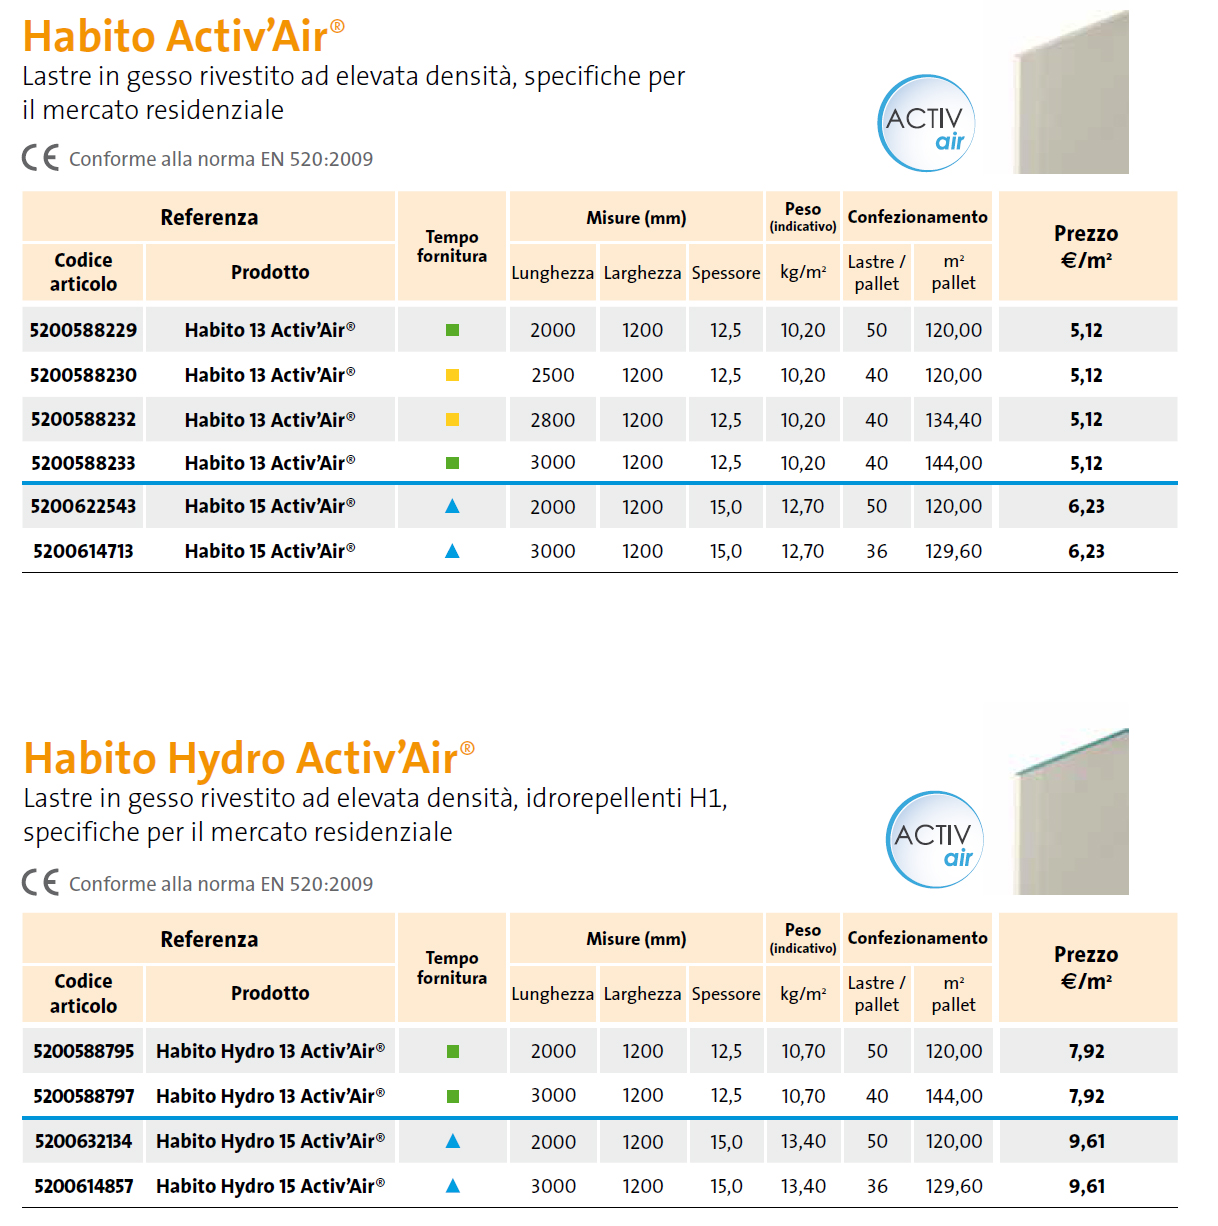 Lastre Habito activ'air per l'edilizia residenziale